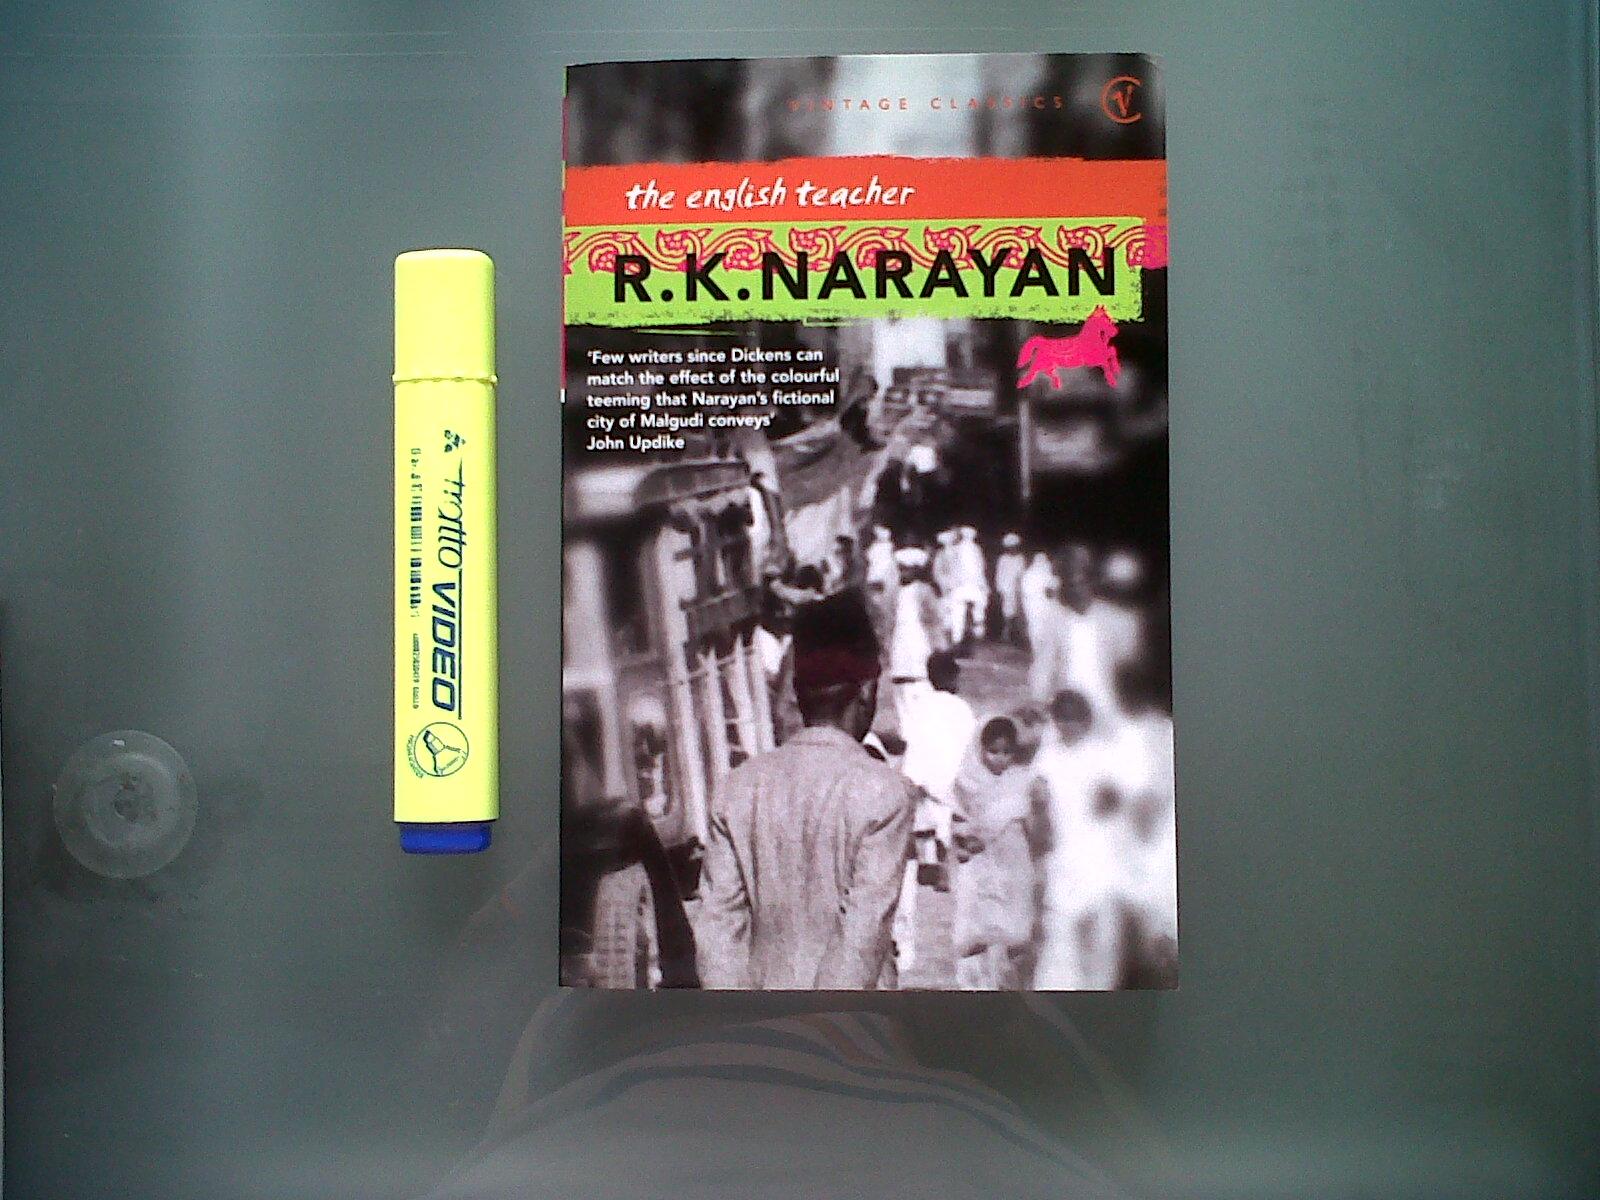 english teacher rk narayan far would you agree statement d